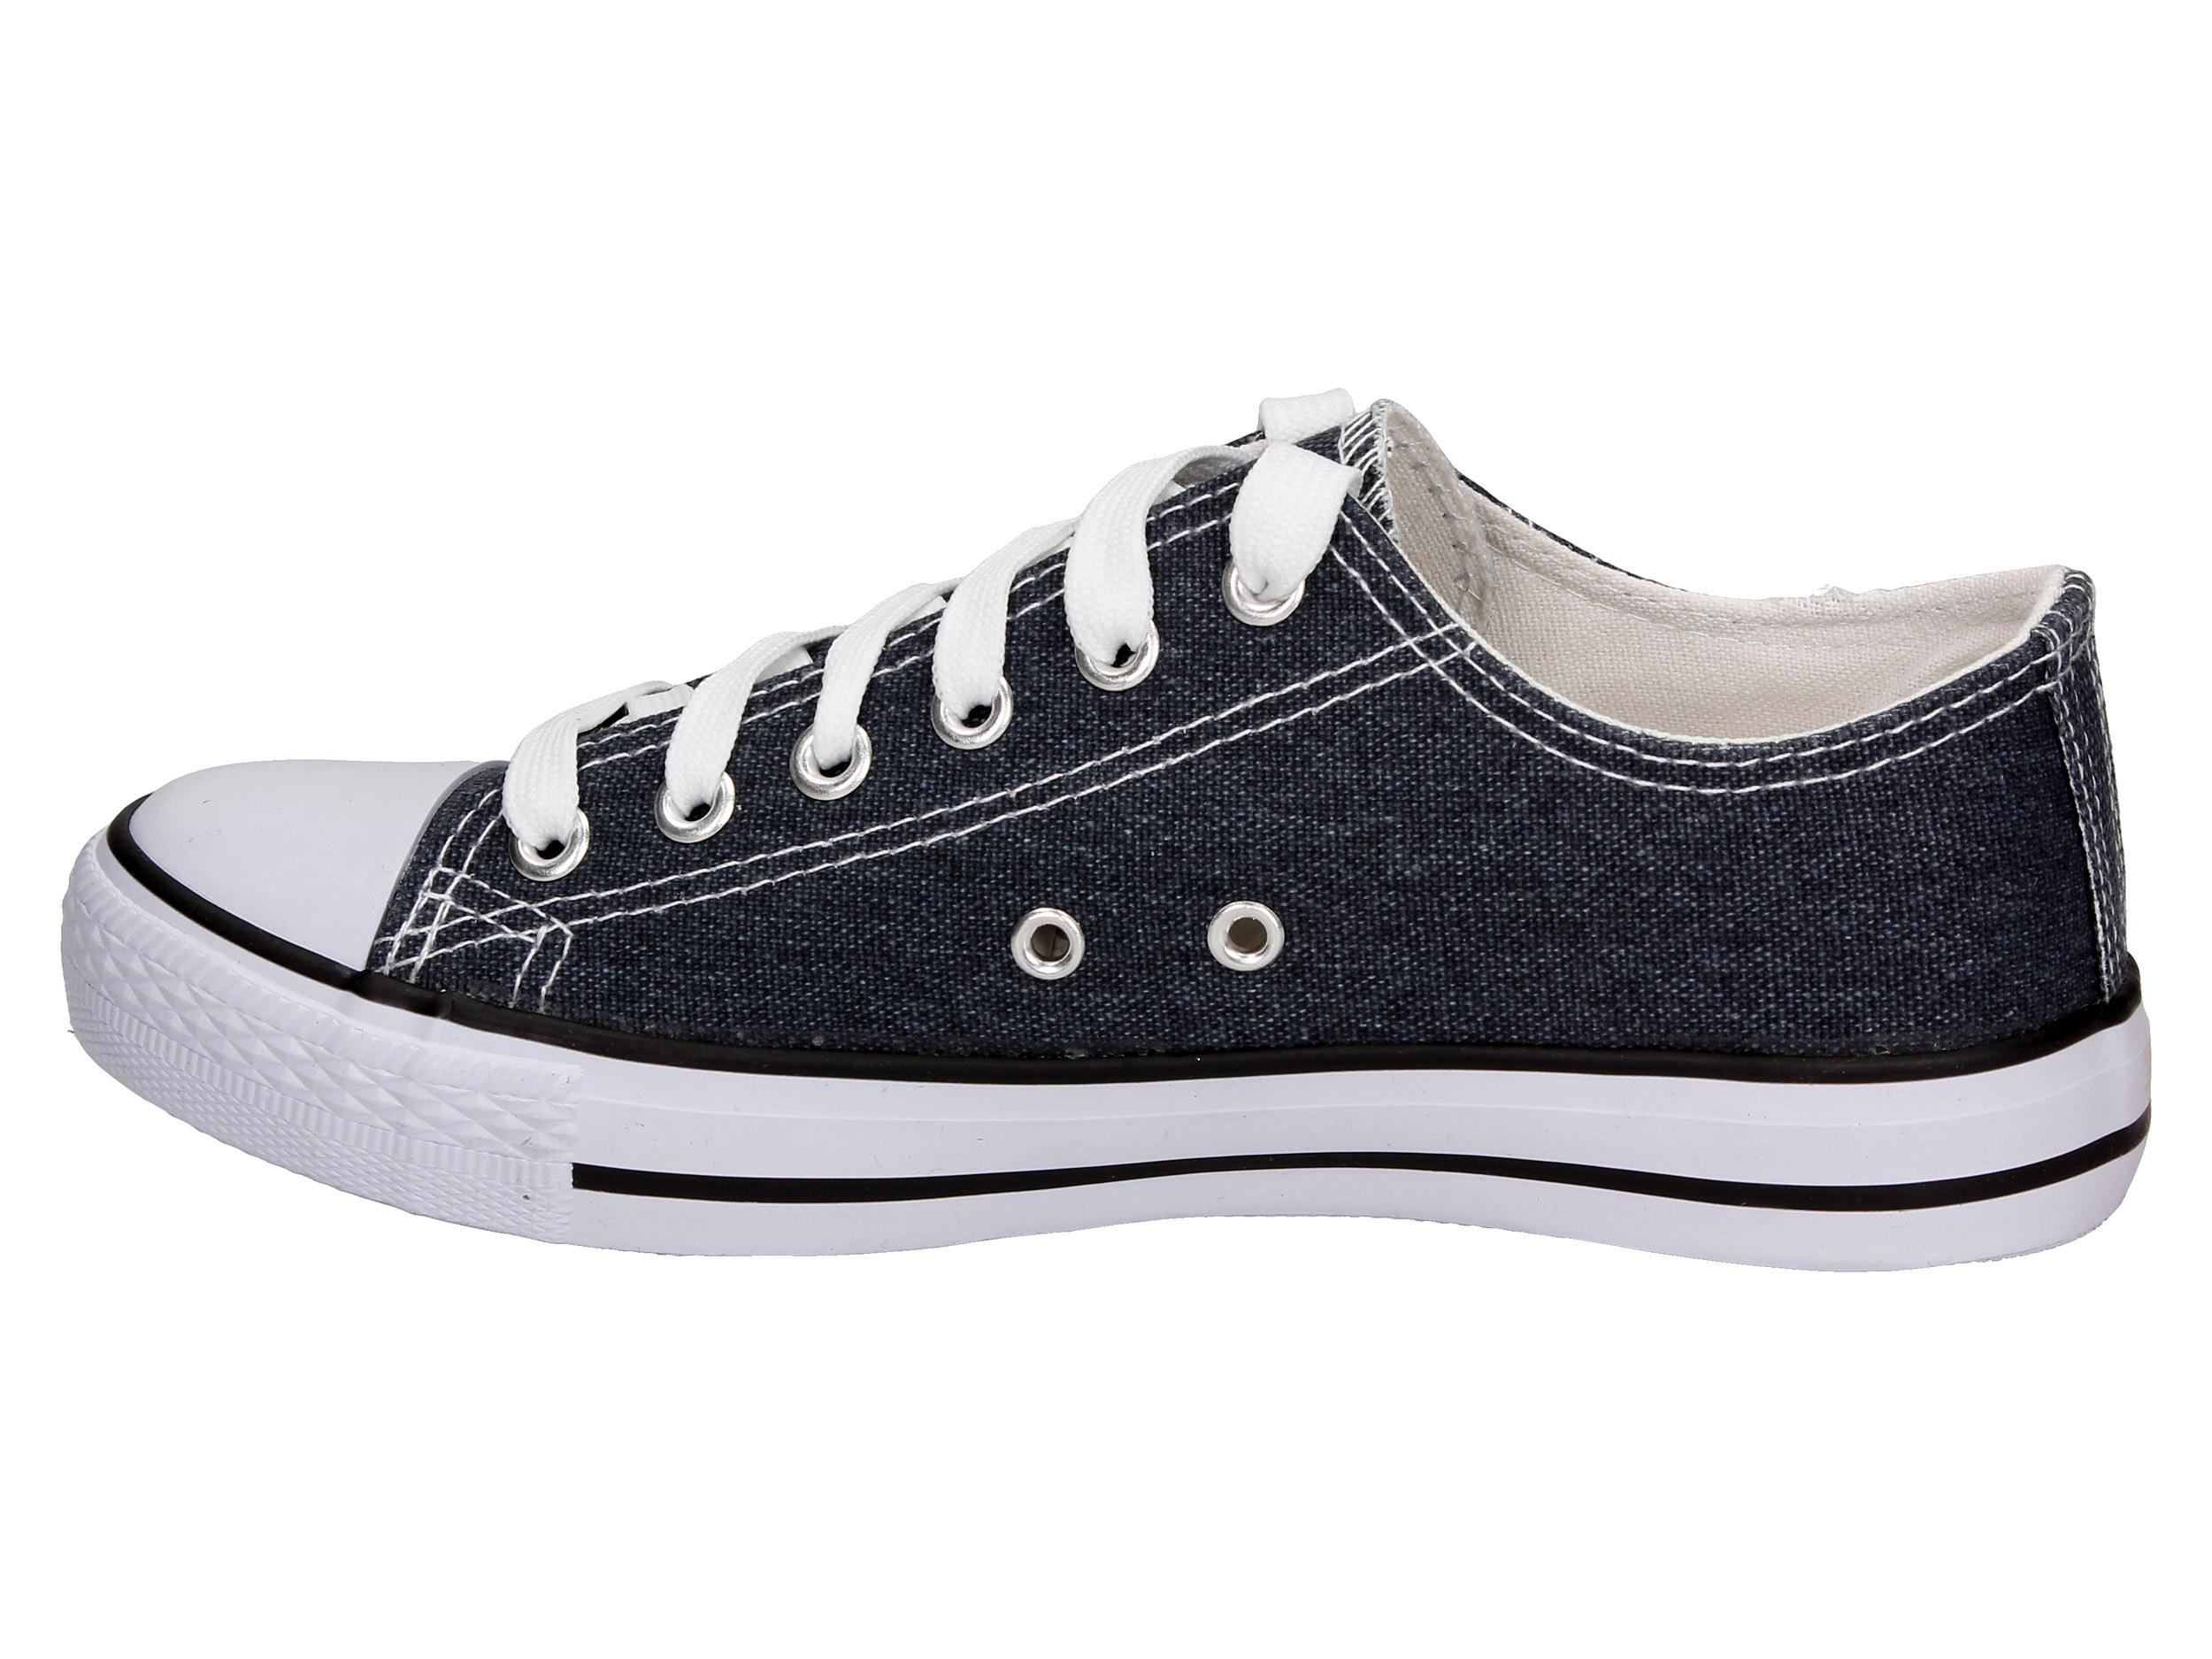 Nowe converse 27 trampki sneakersy szare bez sznurówek